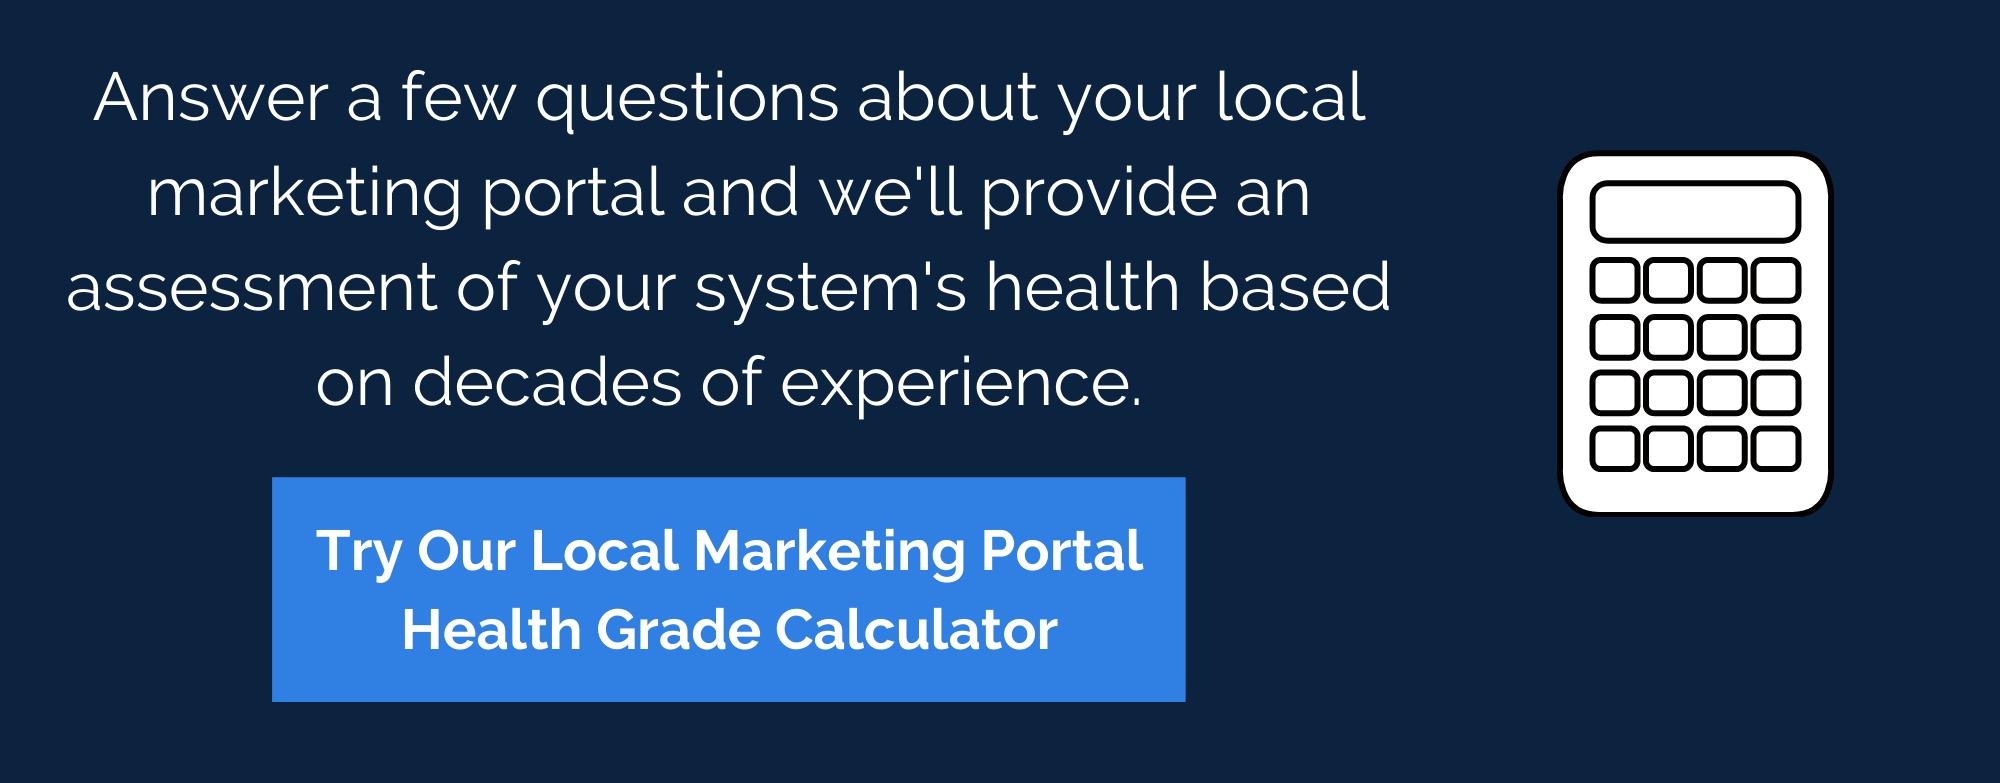 Local Marketing Portal Health Calculator